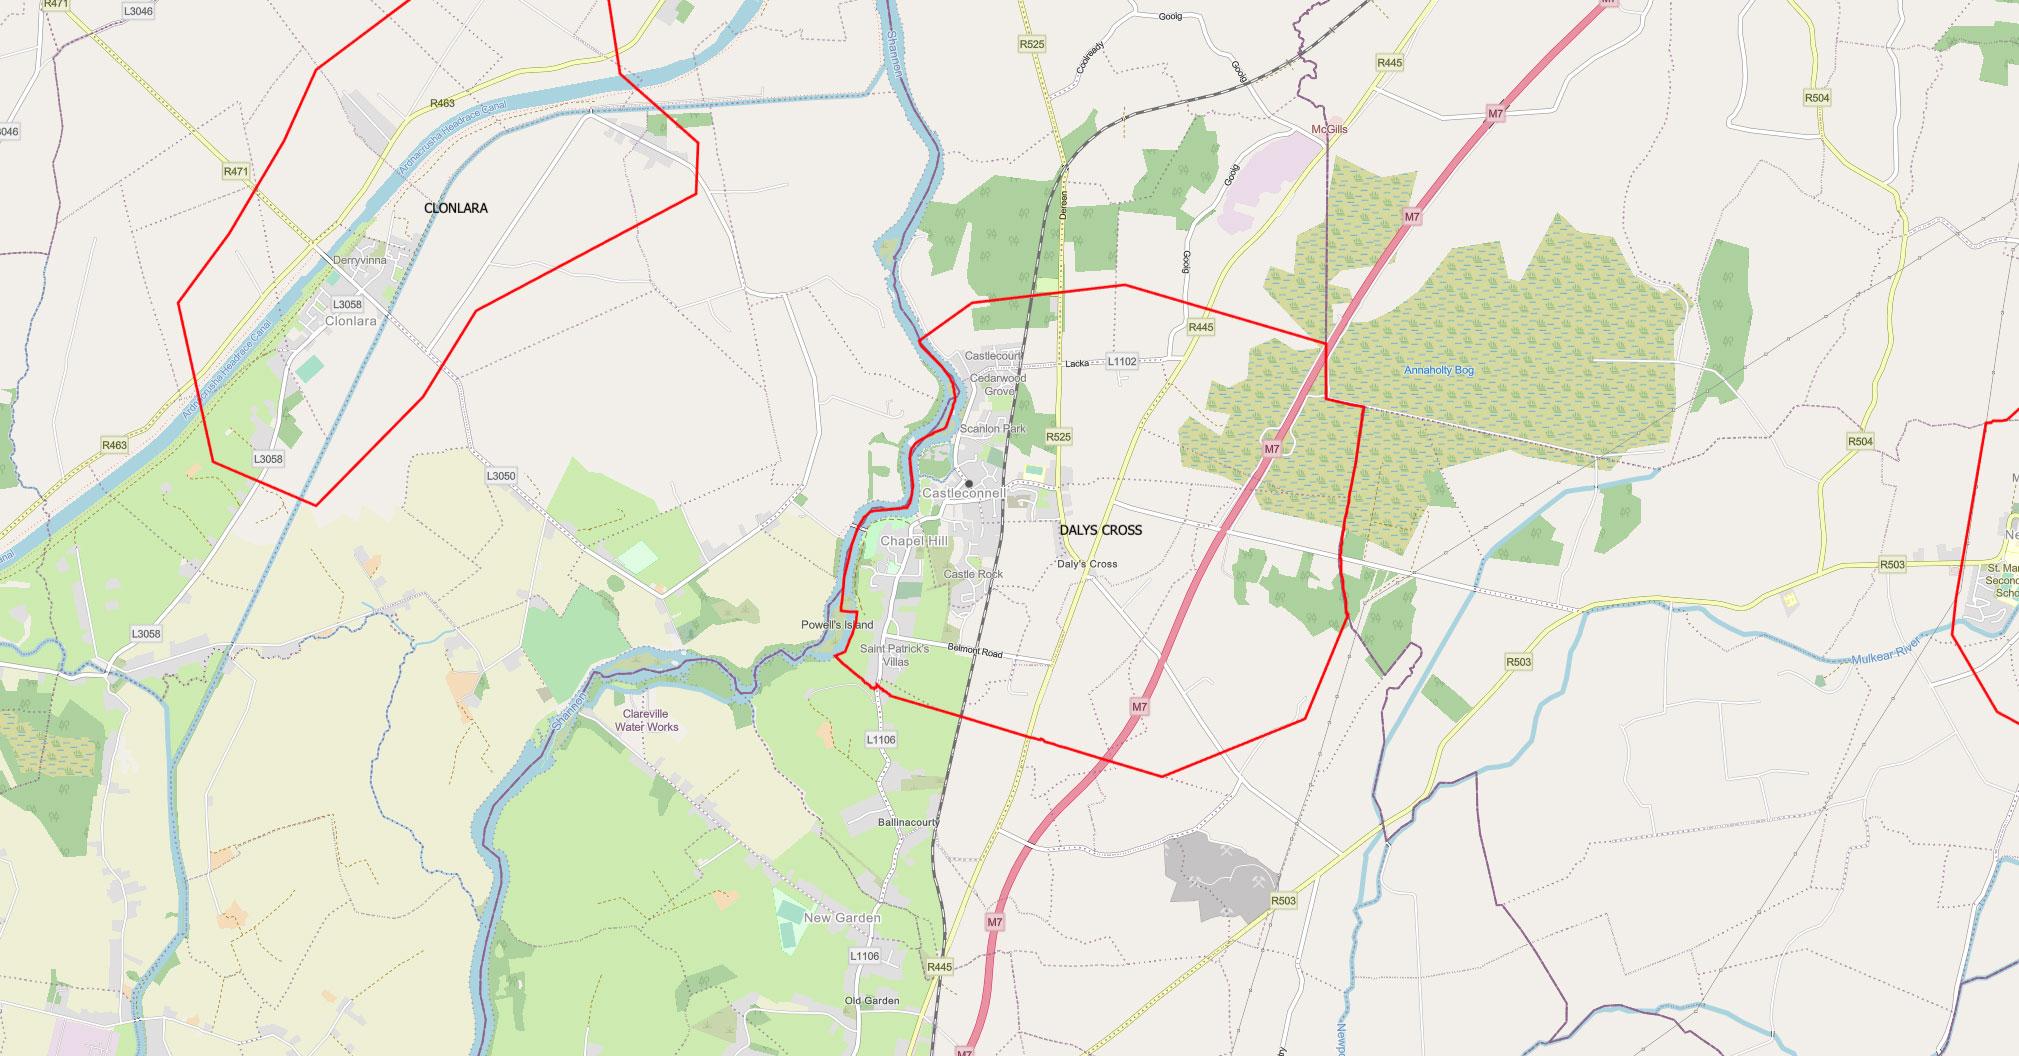 solar-panels-castleconnell-limerick-ireland-map-img